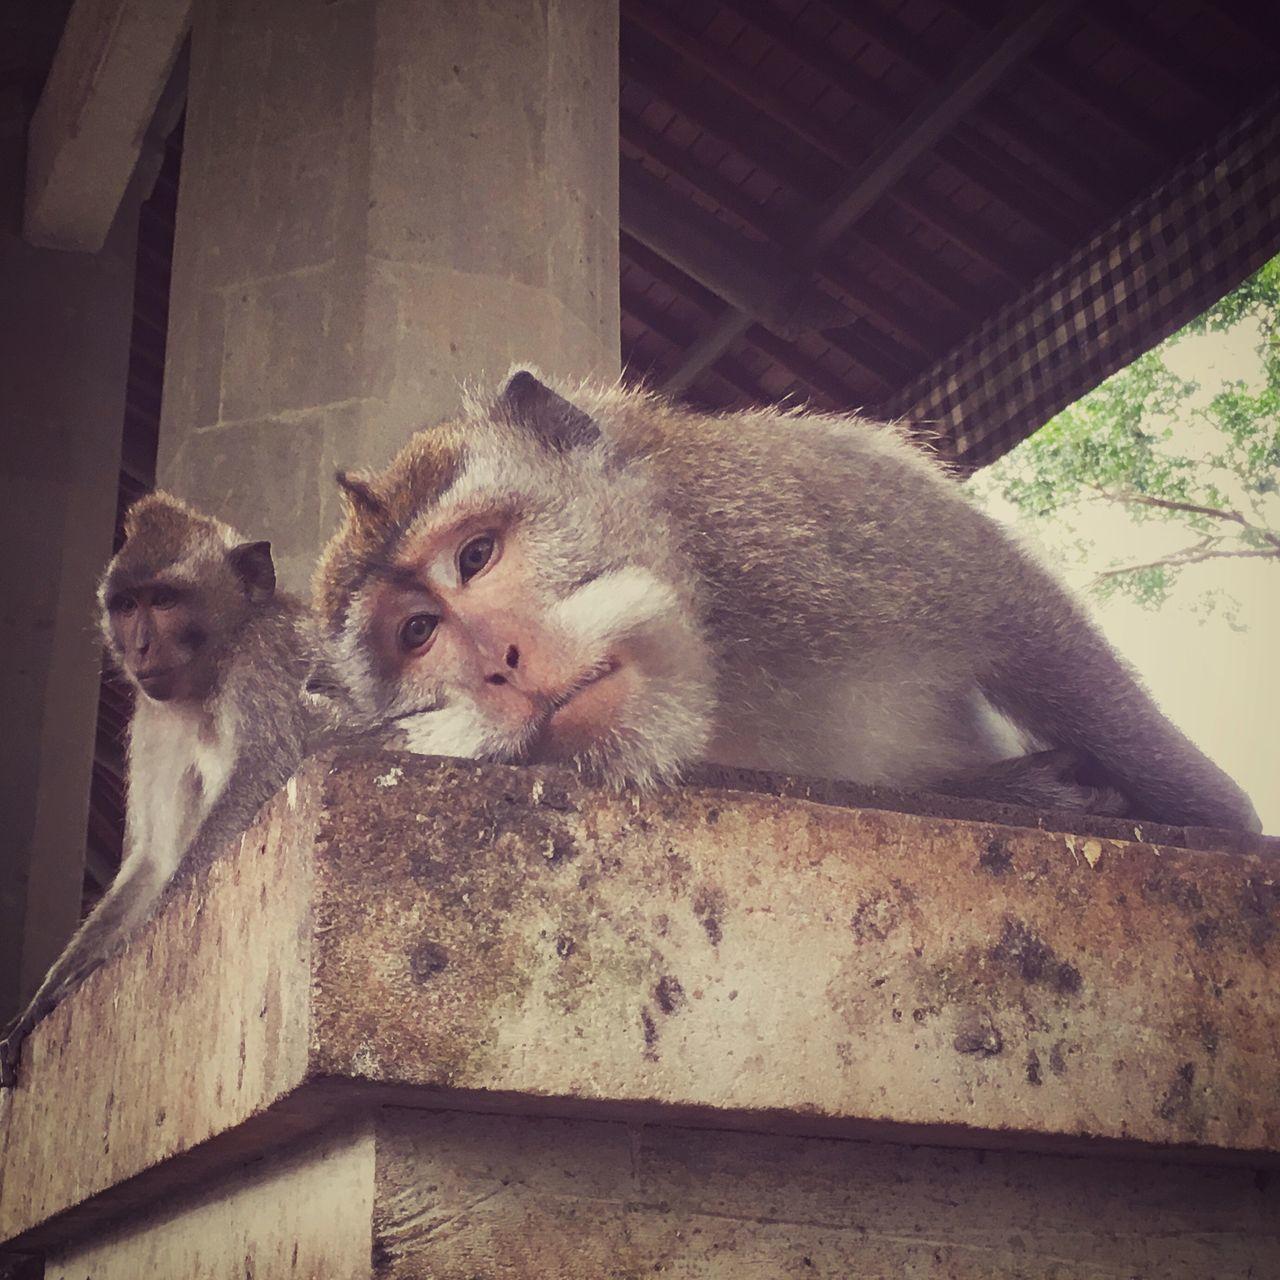 Bali Holy Lazy Lazy Day Monkey Temple Monkeys Temple Ubud